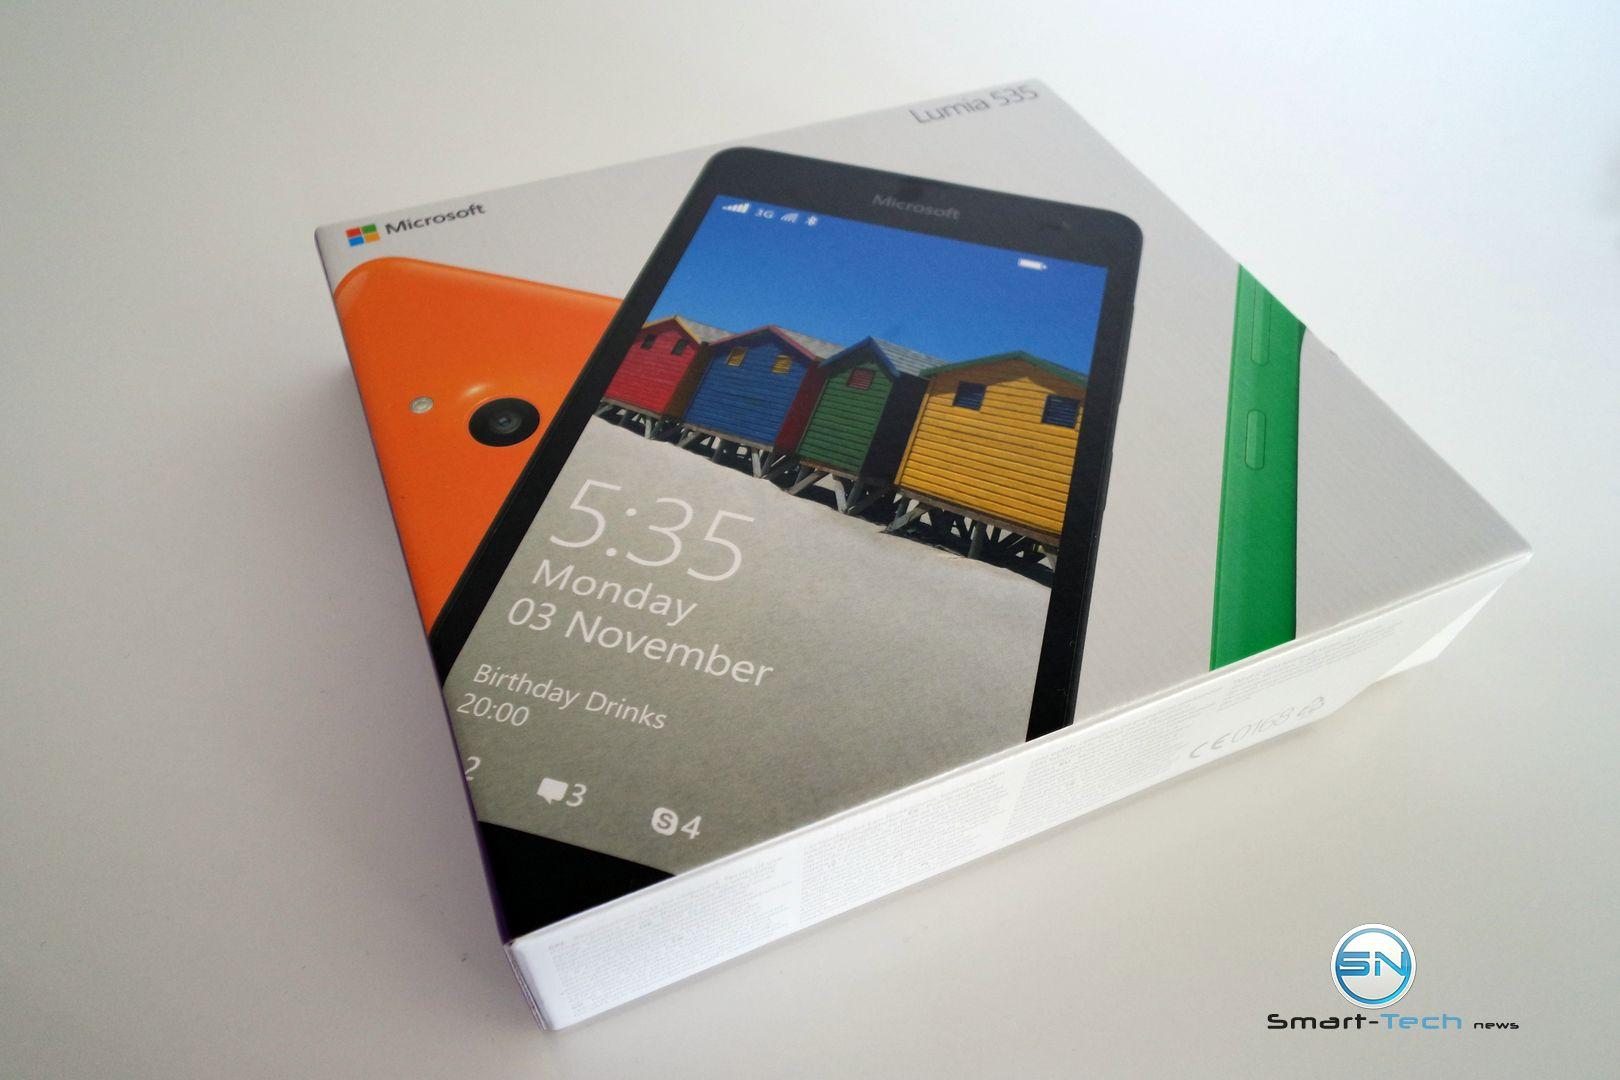 Unboxing des Microsoft Lumia 535